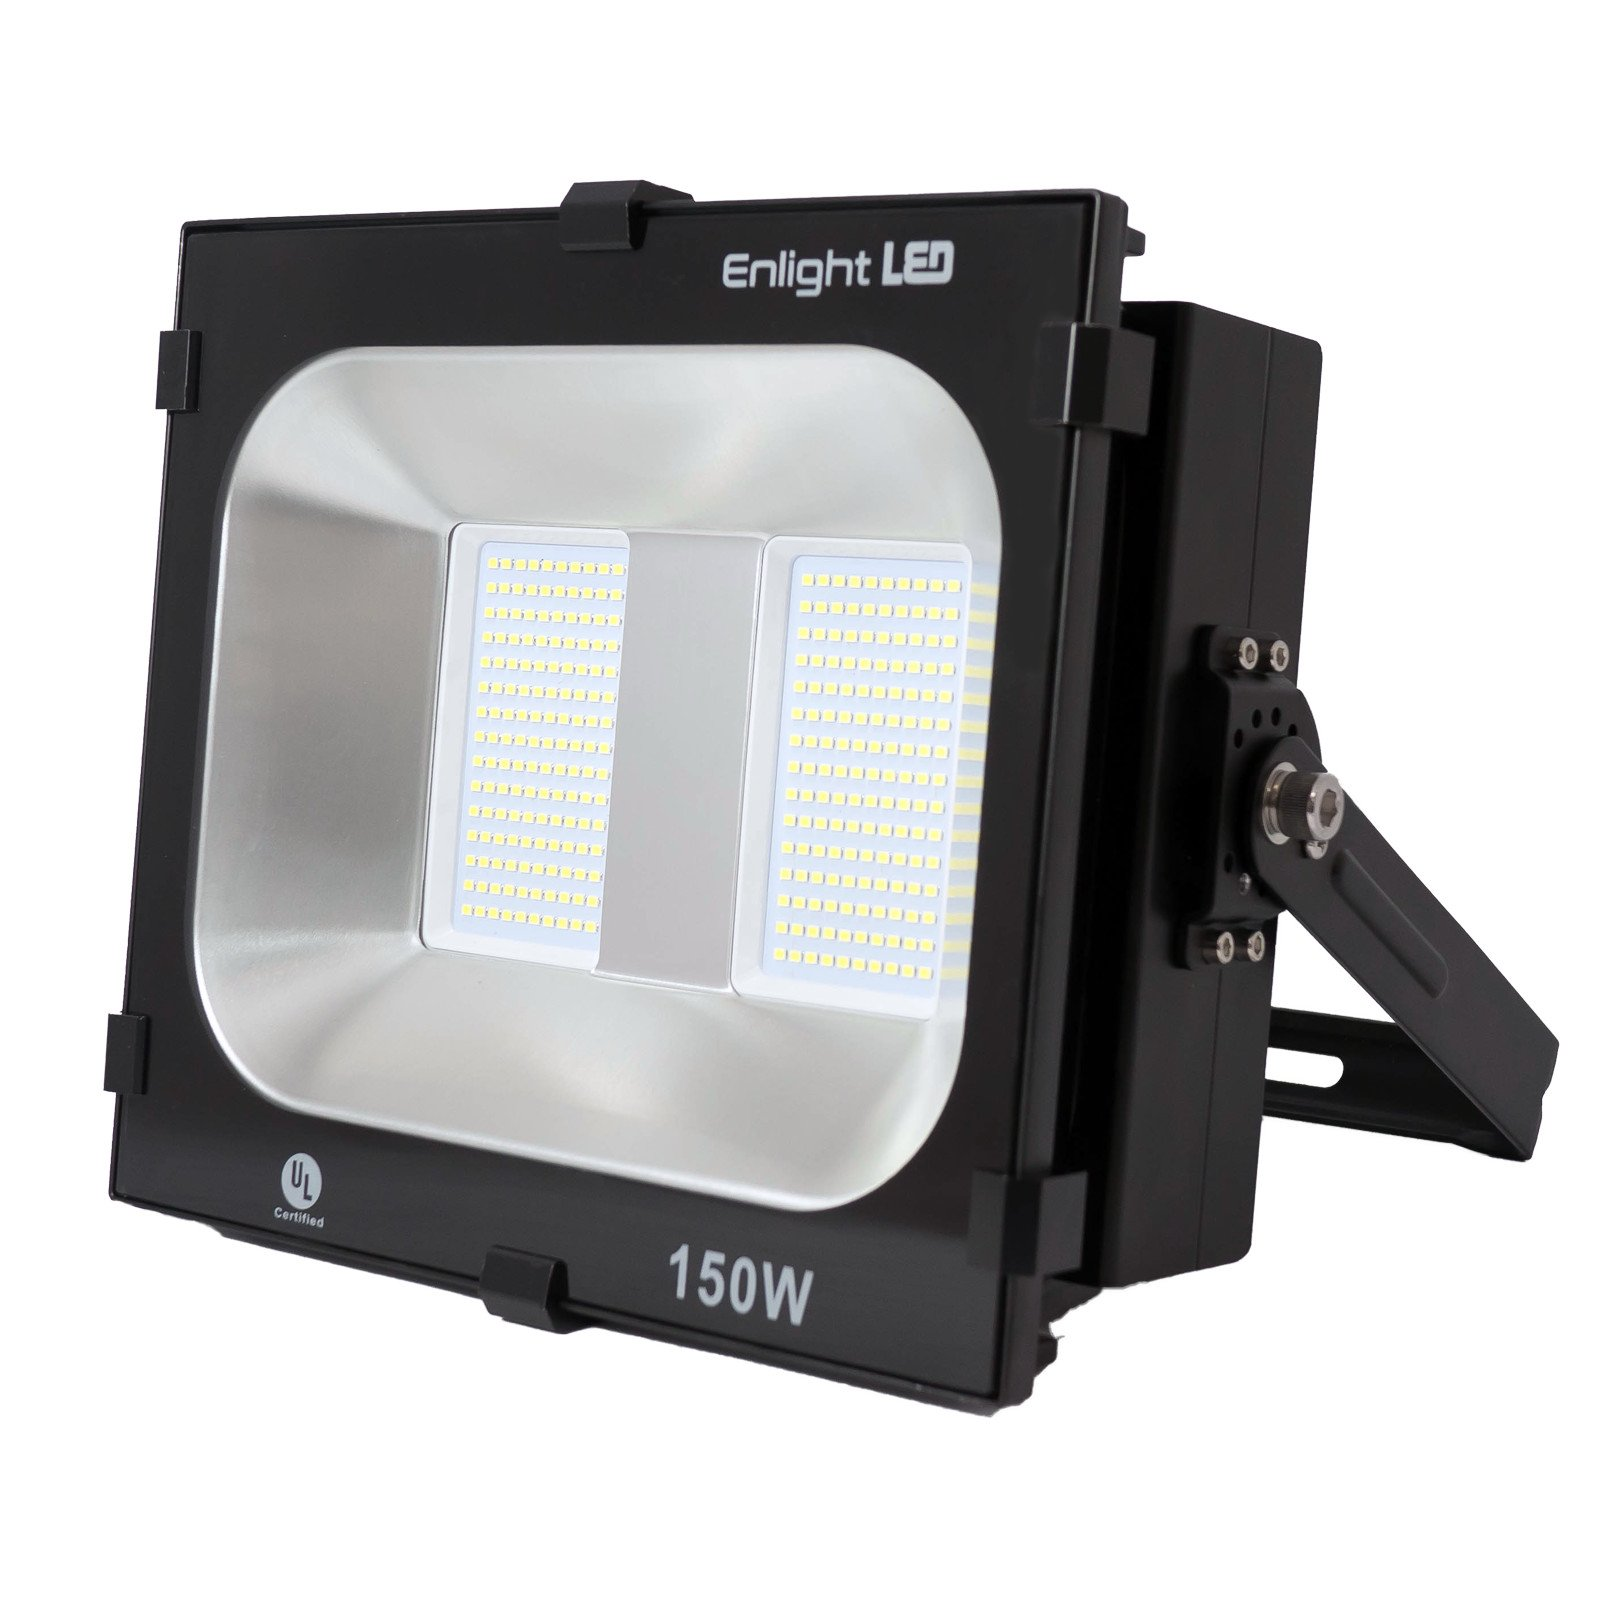 Enlight LED LD-FD-K150U UL Certified 150W LED Flood Light 120 Degree Light Angle 15,000 lm, Cool White, Heavy Duty Aluminum